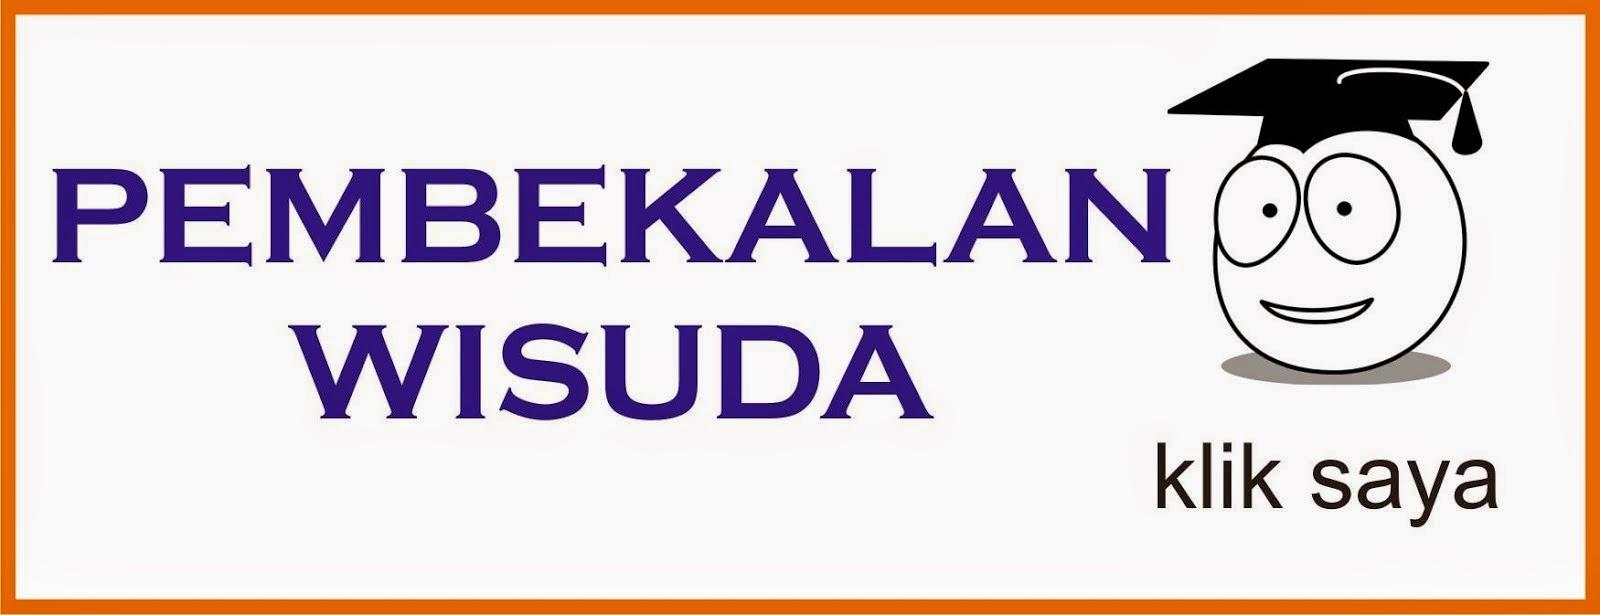 Pembekalan wisudawan periode II 2015